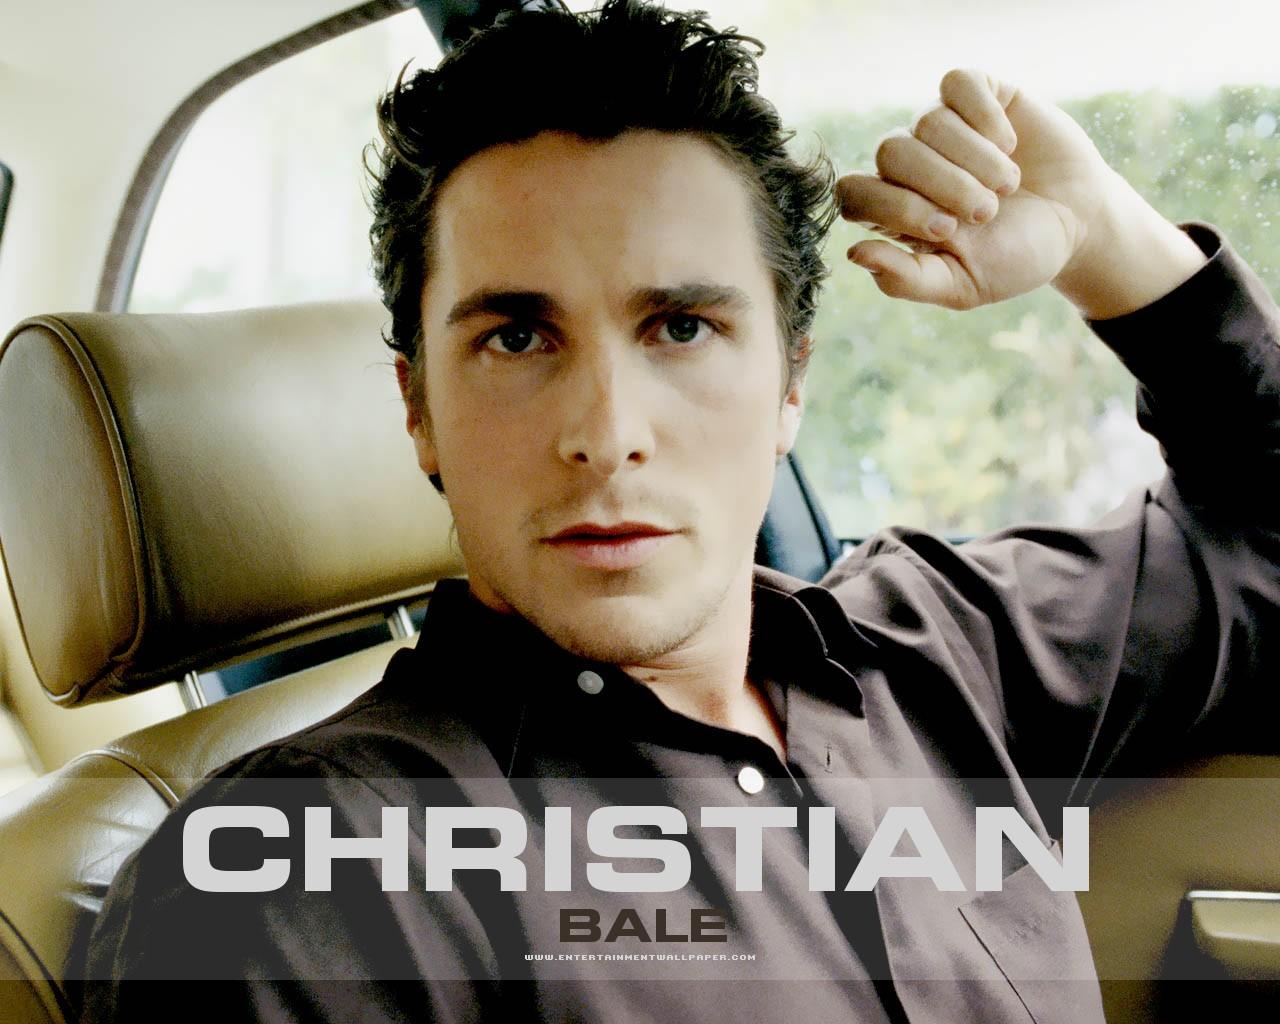 Christian Bale: Christian Bale New Photos